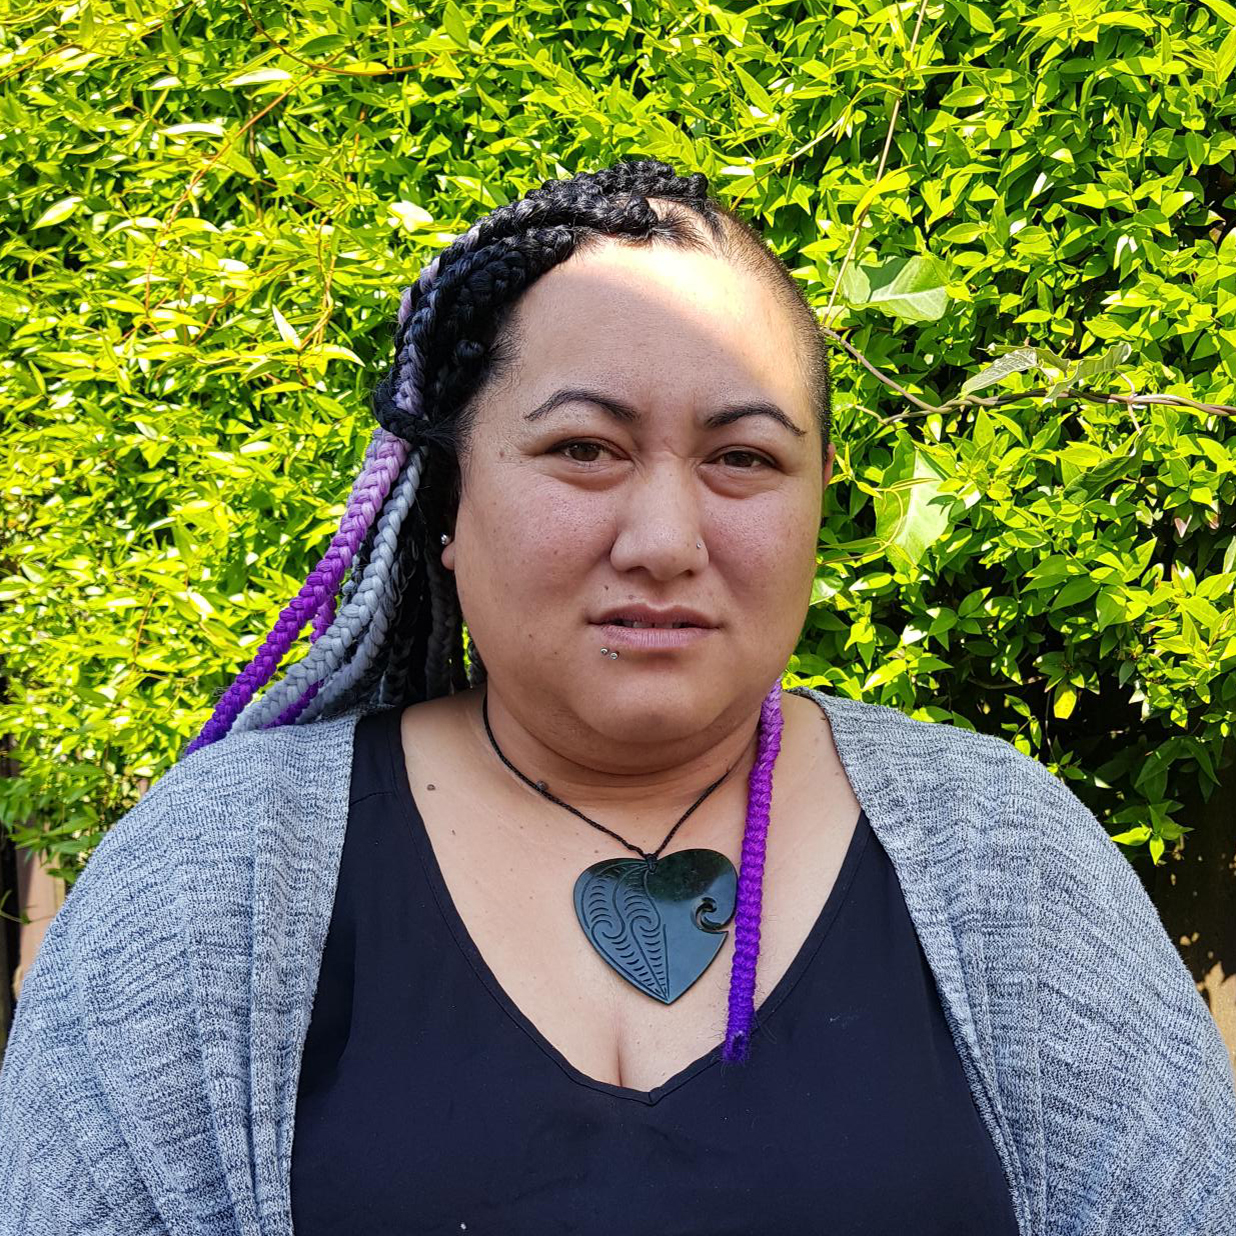 ALICIA TUAU - Social Support Worker Whare 4 Whānau